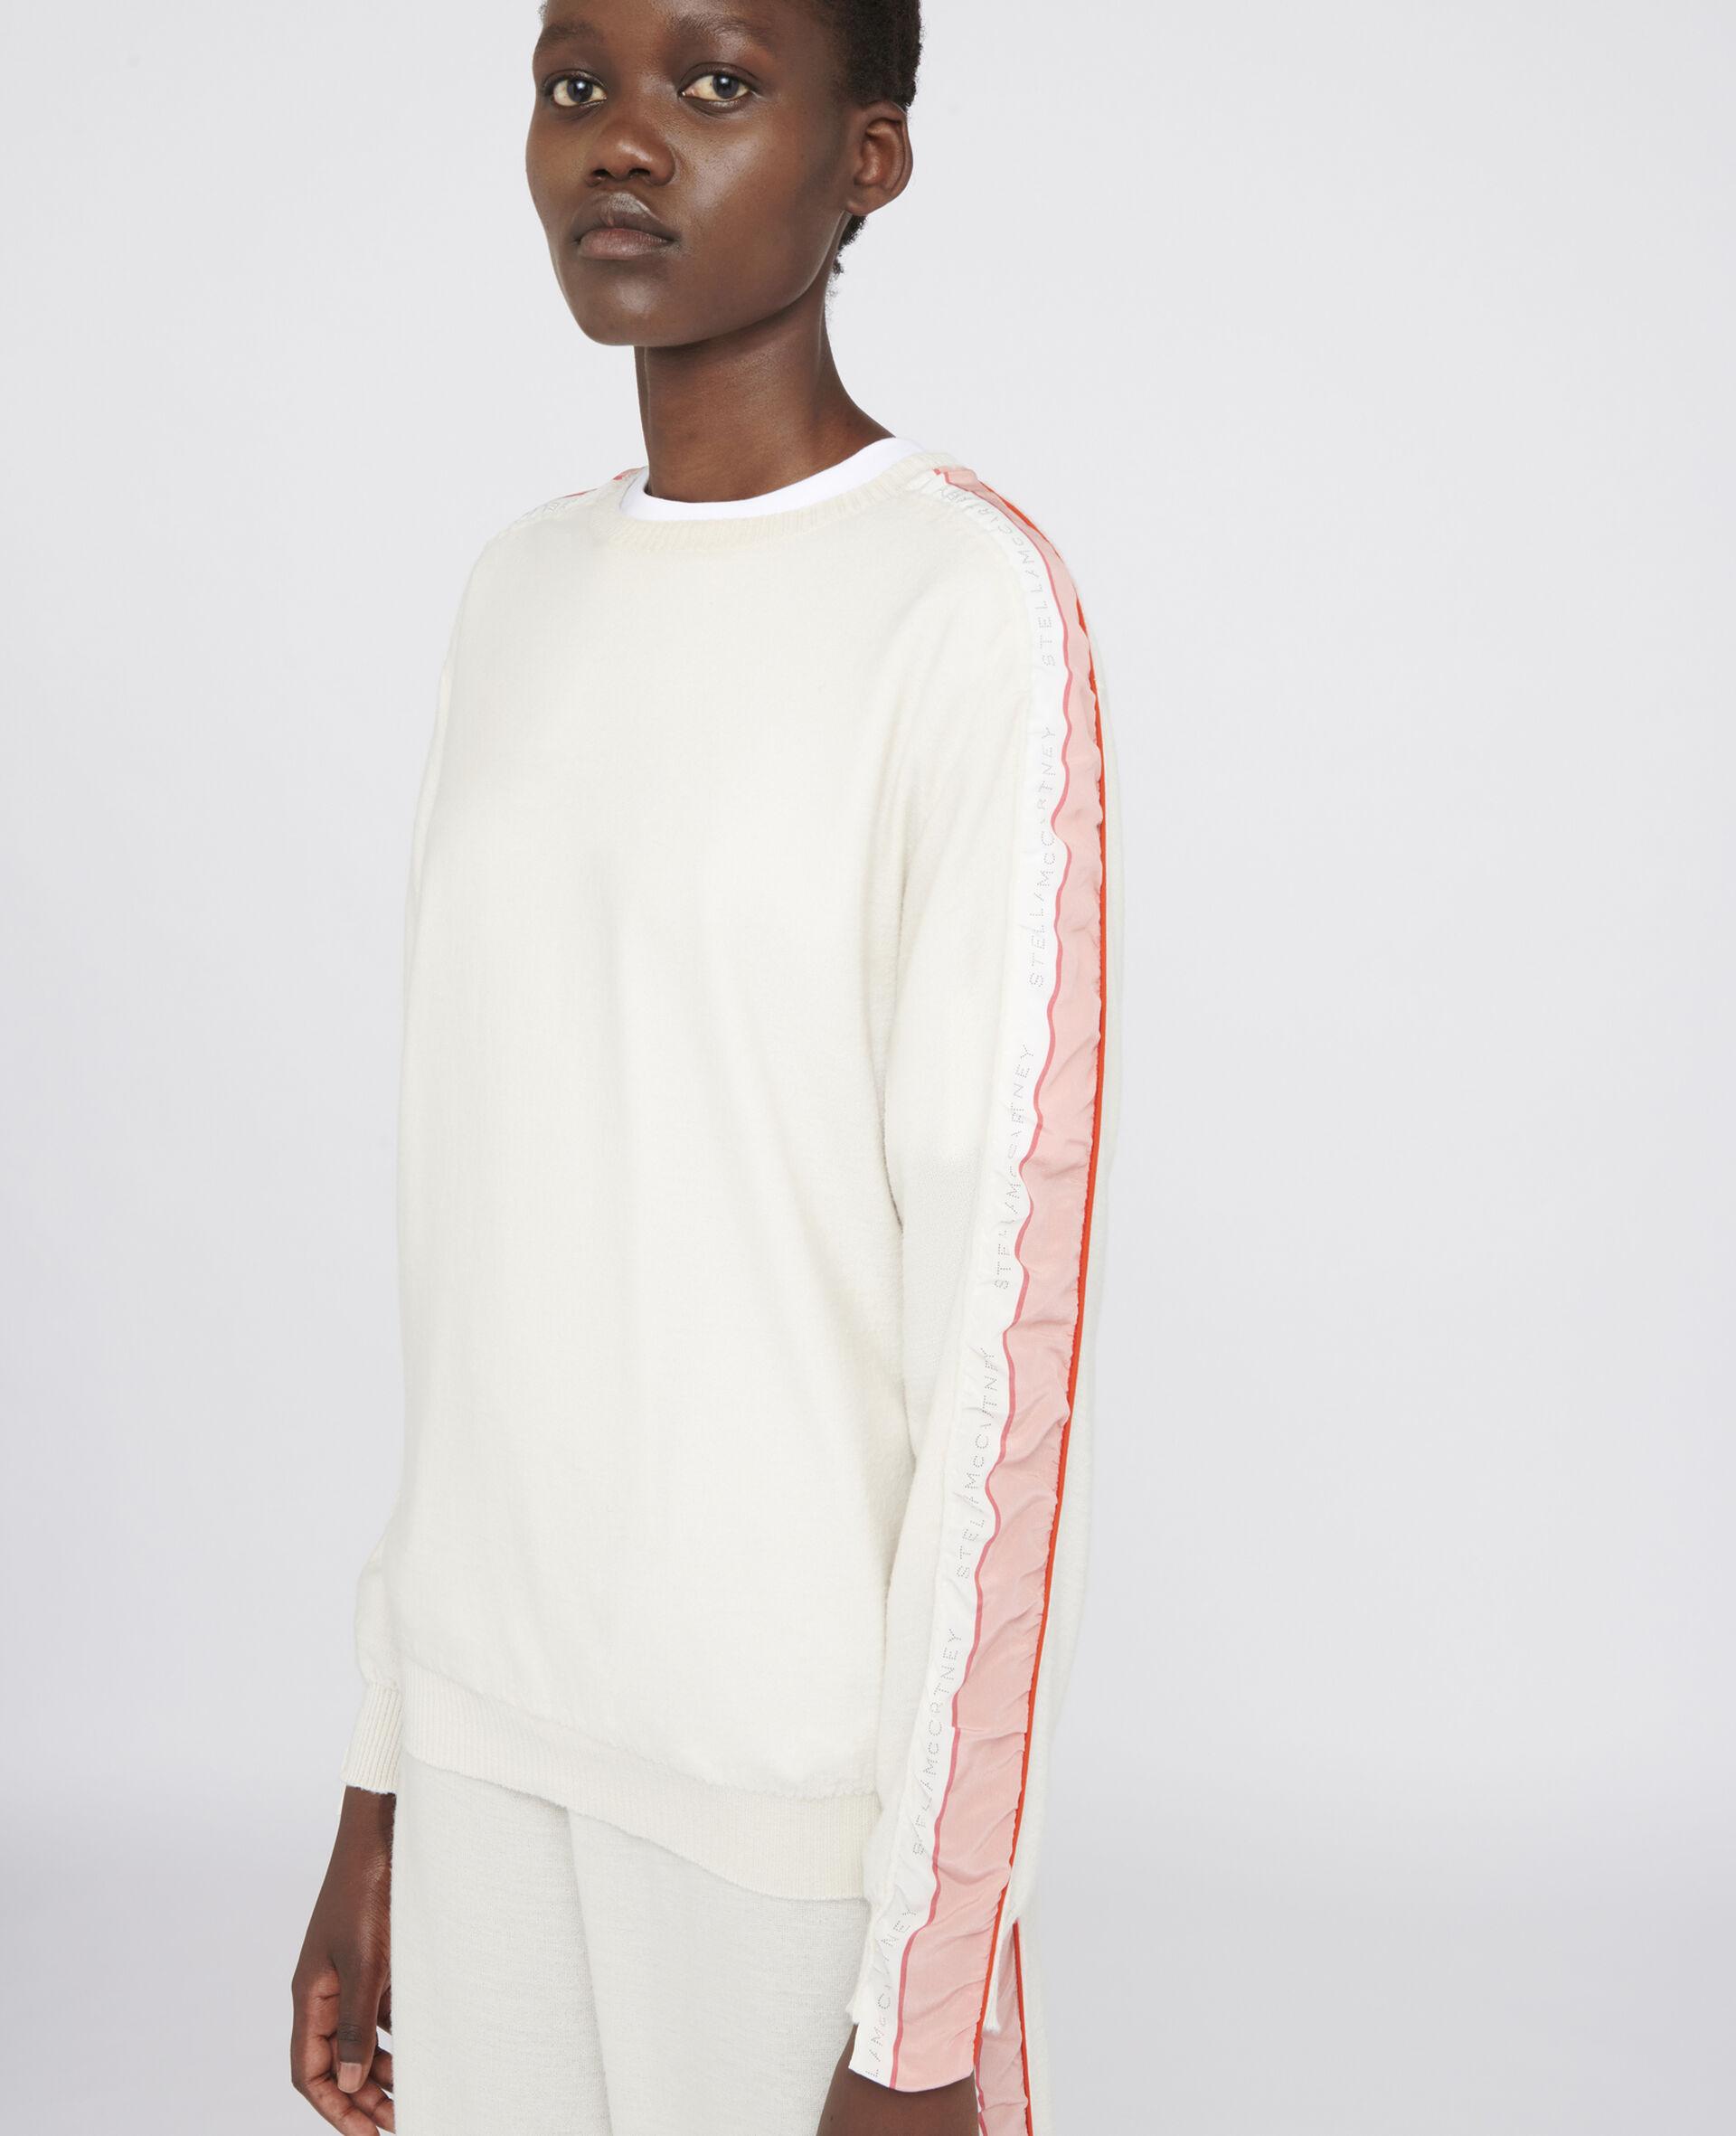 Monogram Wool Sweater-Beige-large image number 3